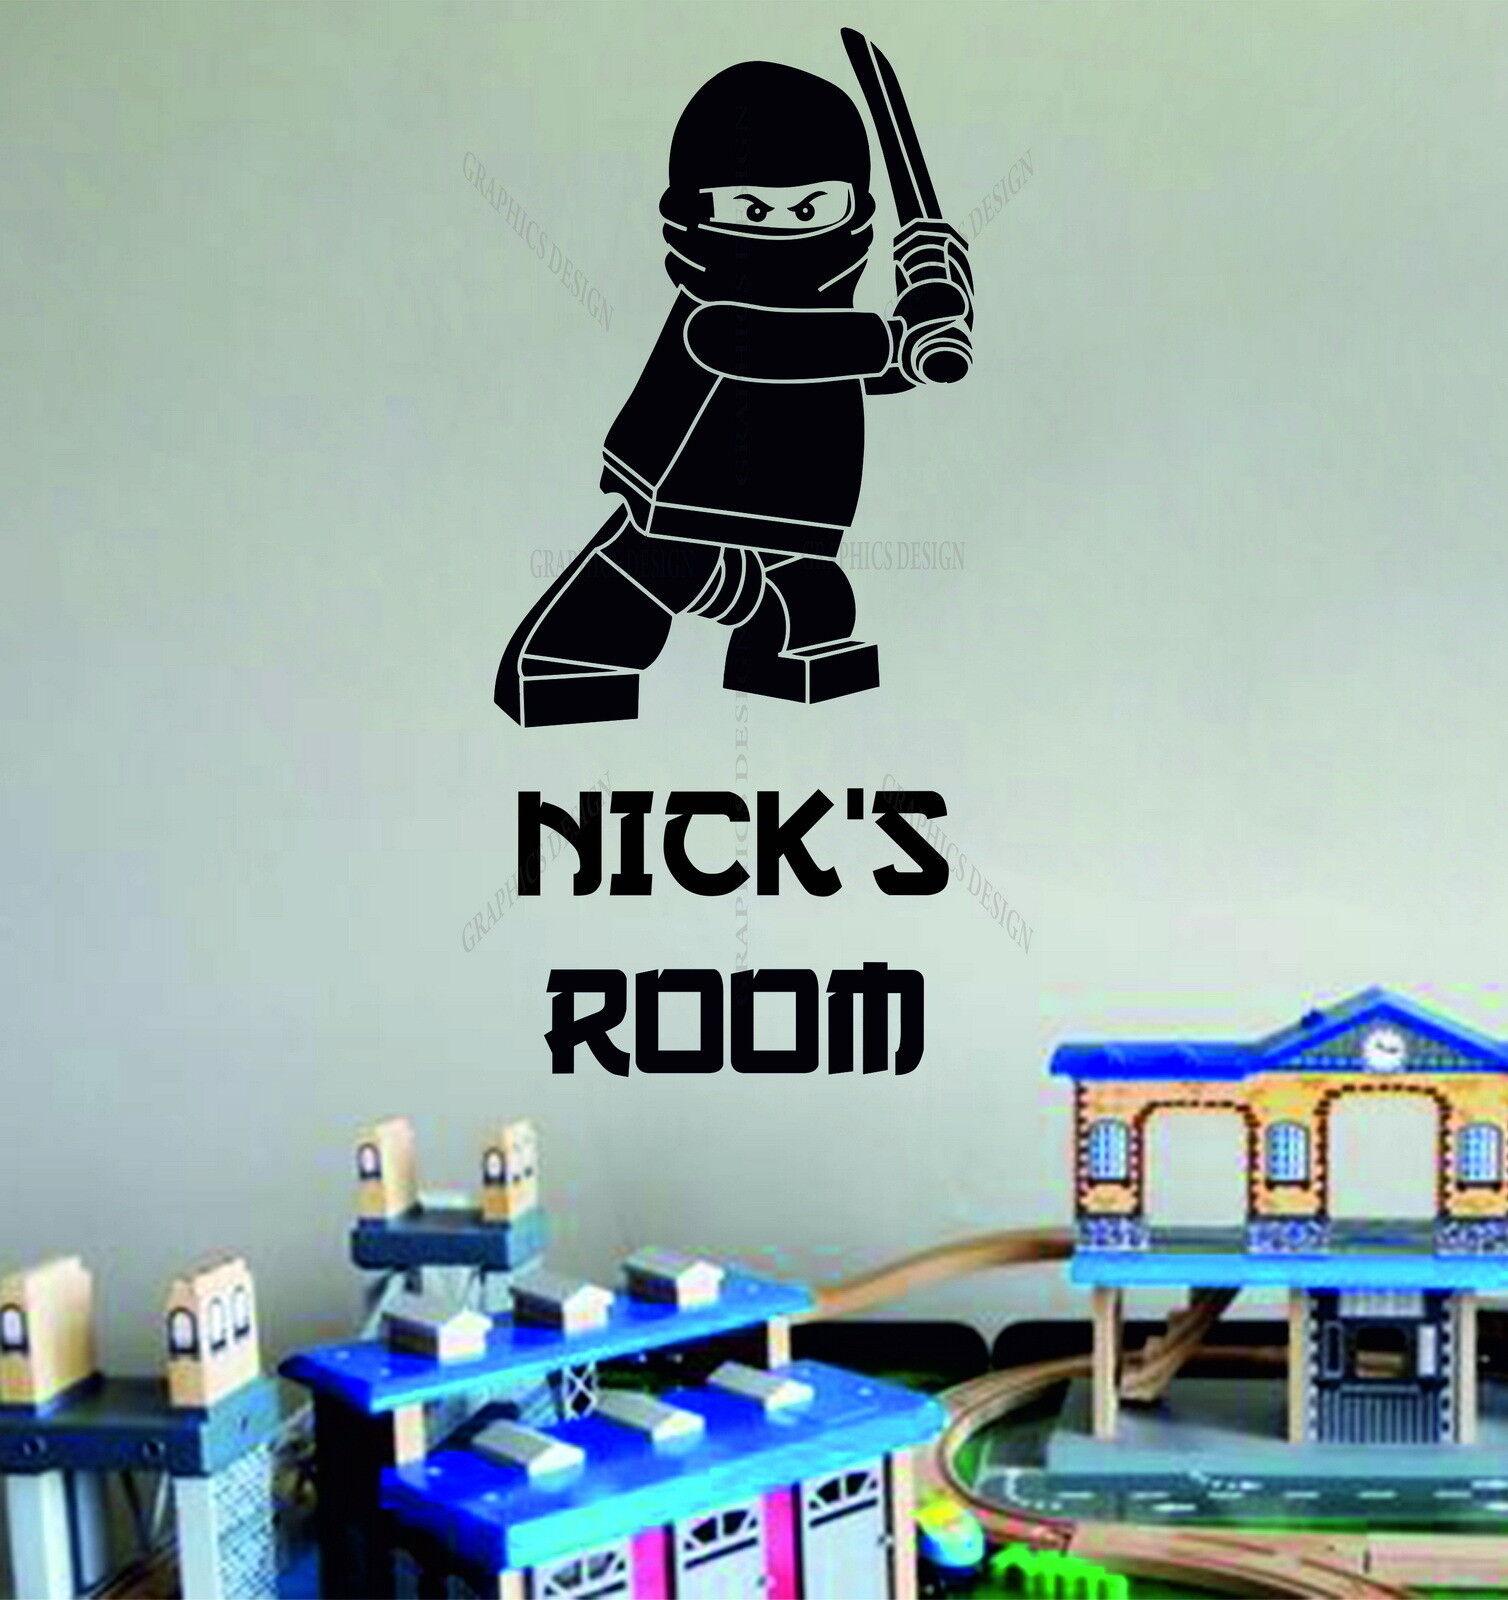 Lego Superhero Ninjago Personalised Children 39 S Bedroom Decor Vinyl Wall Sticker Ebay